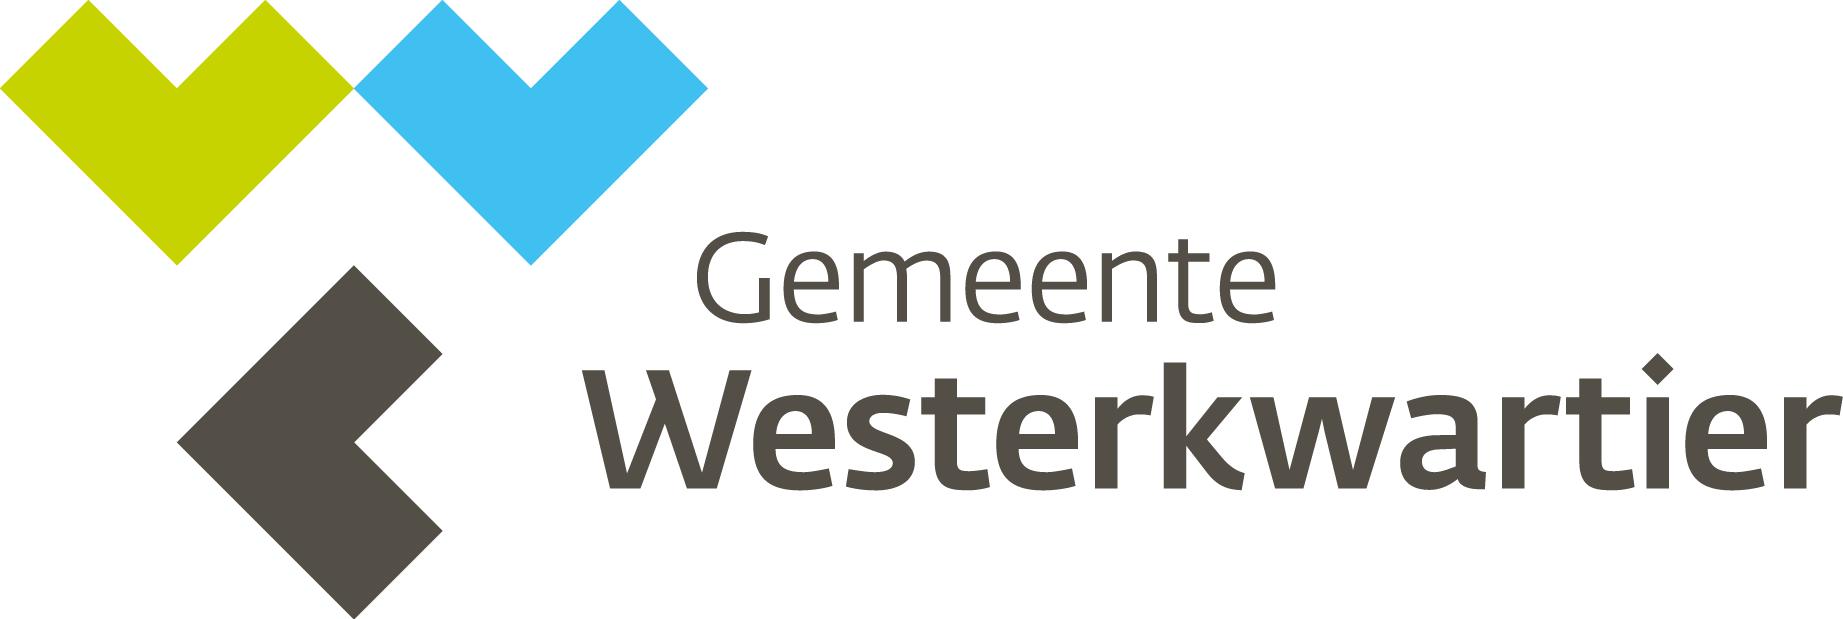 Gemeente Westerkwartier logo